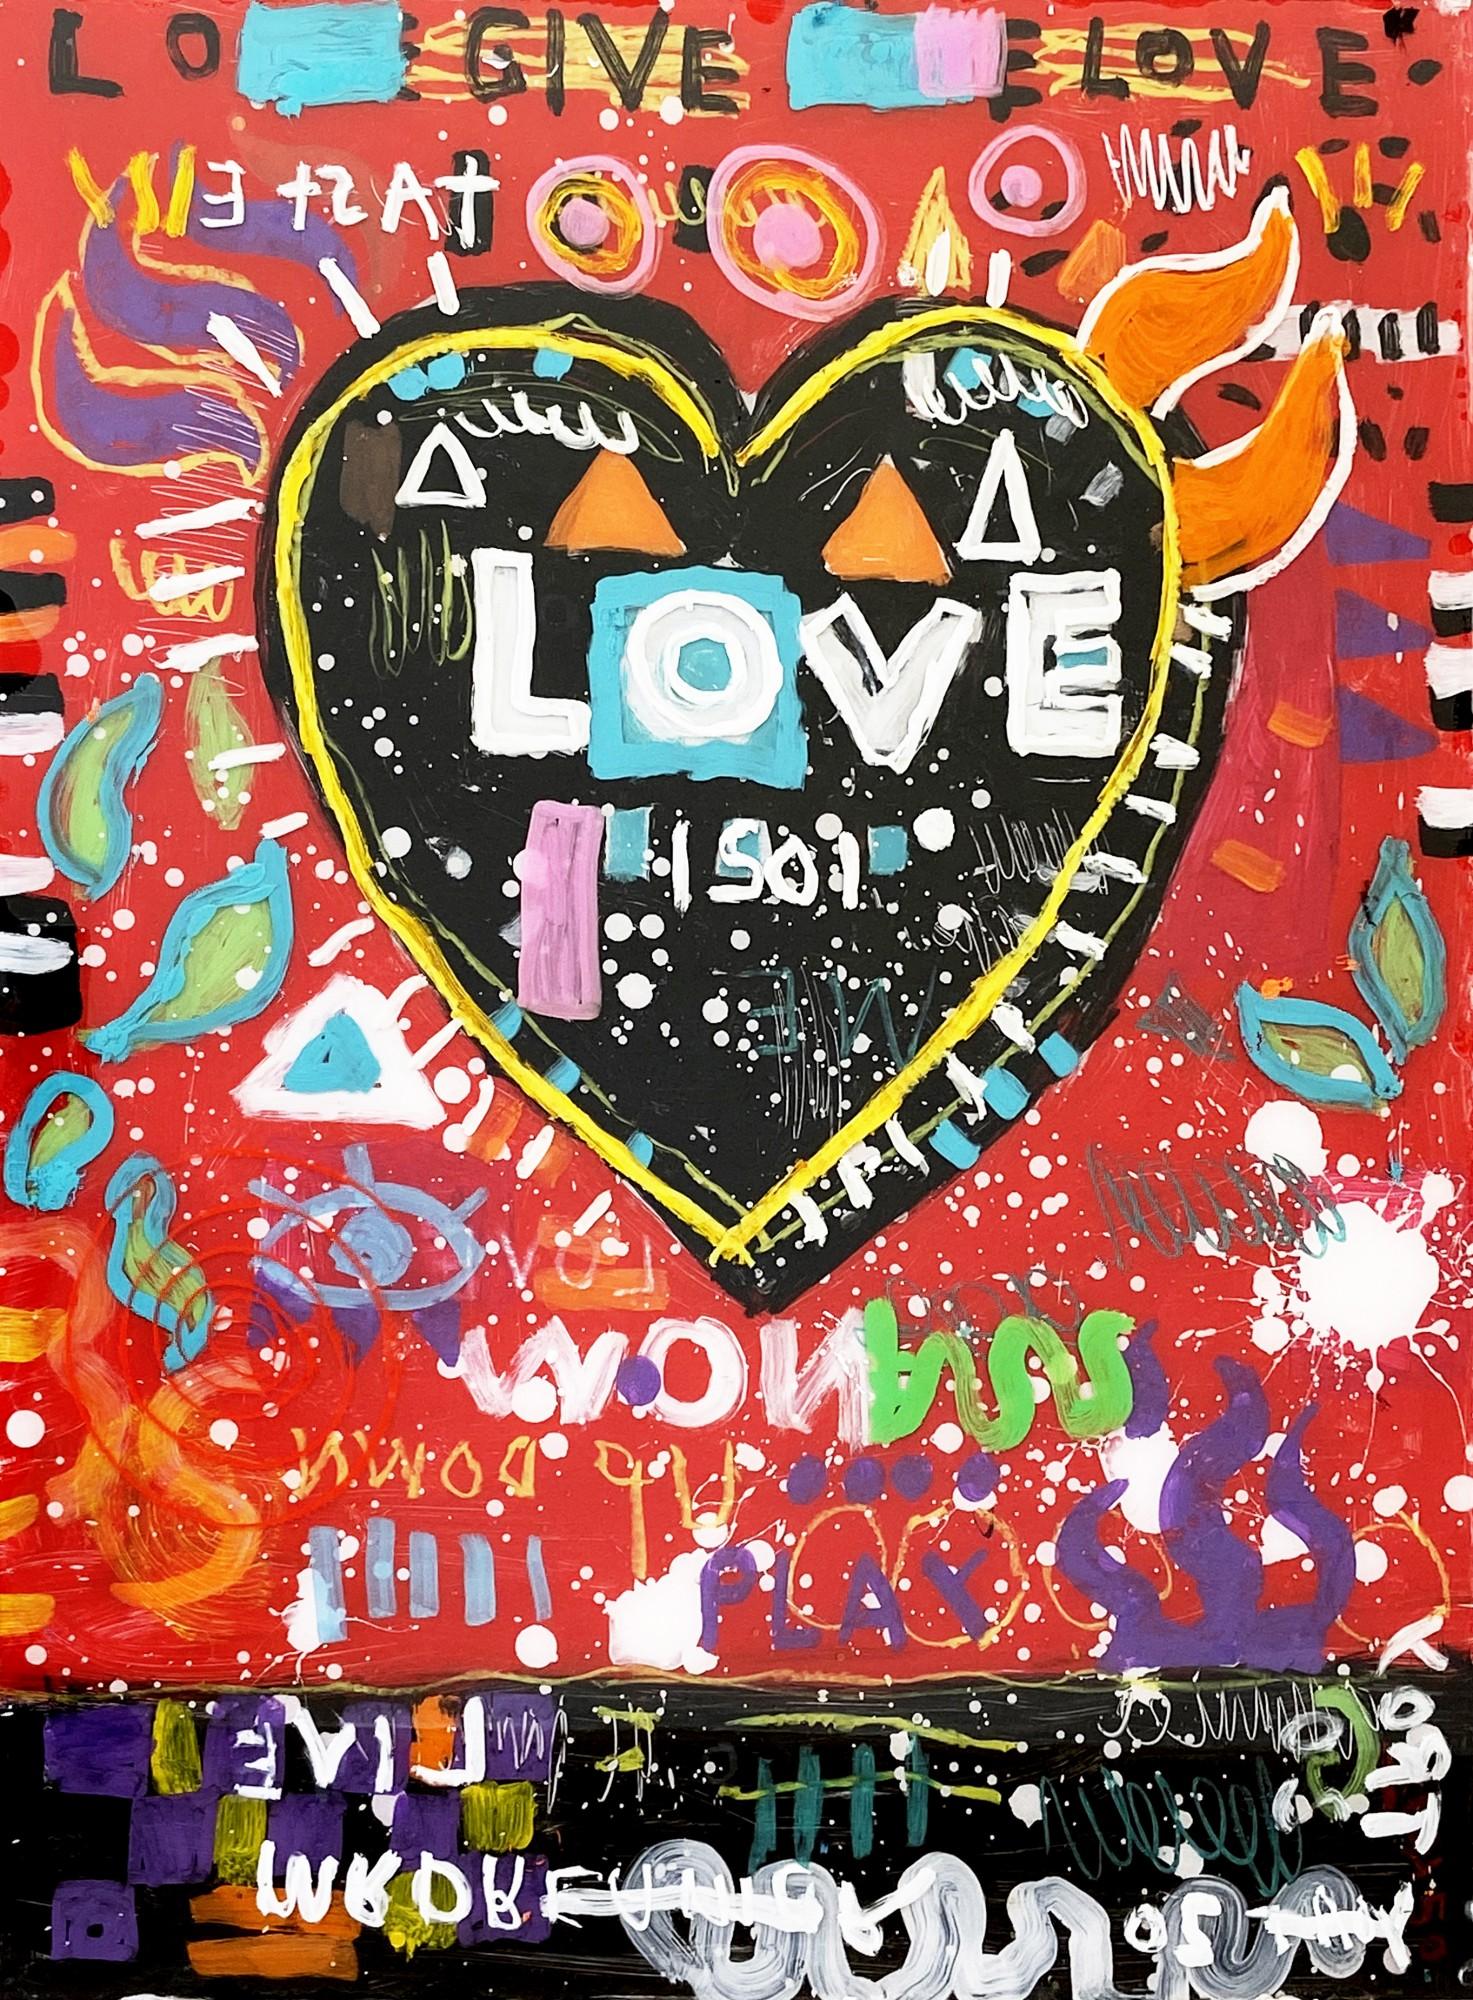 Troy Henriksen - Give love